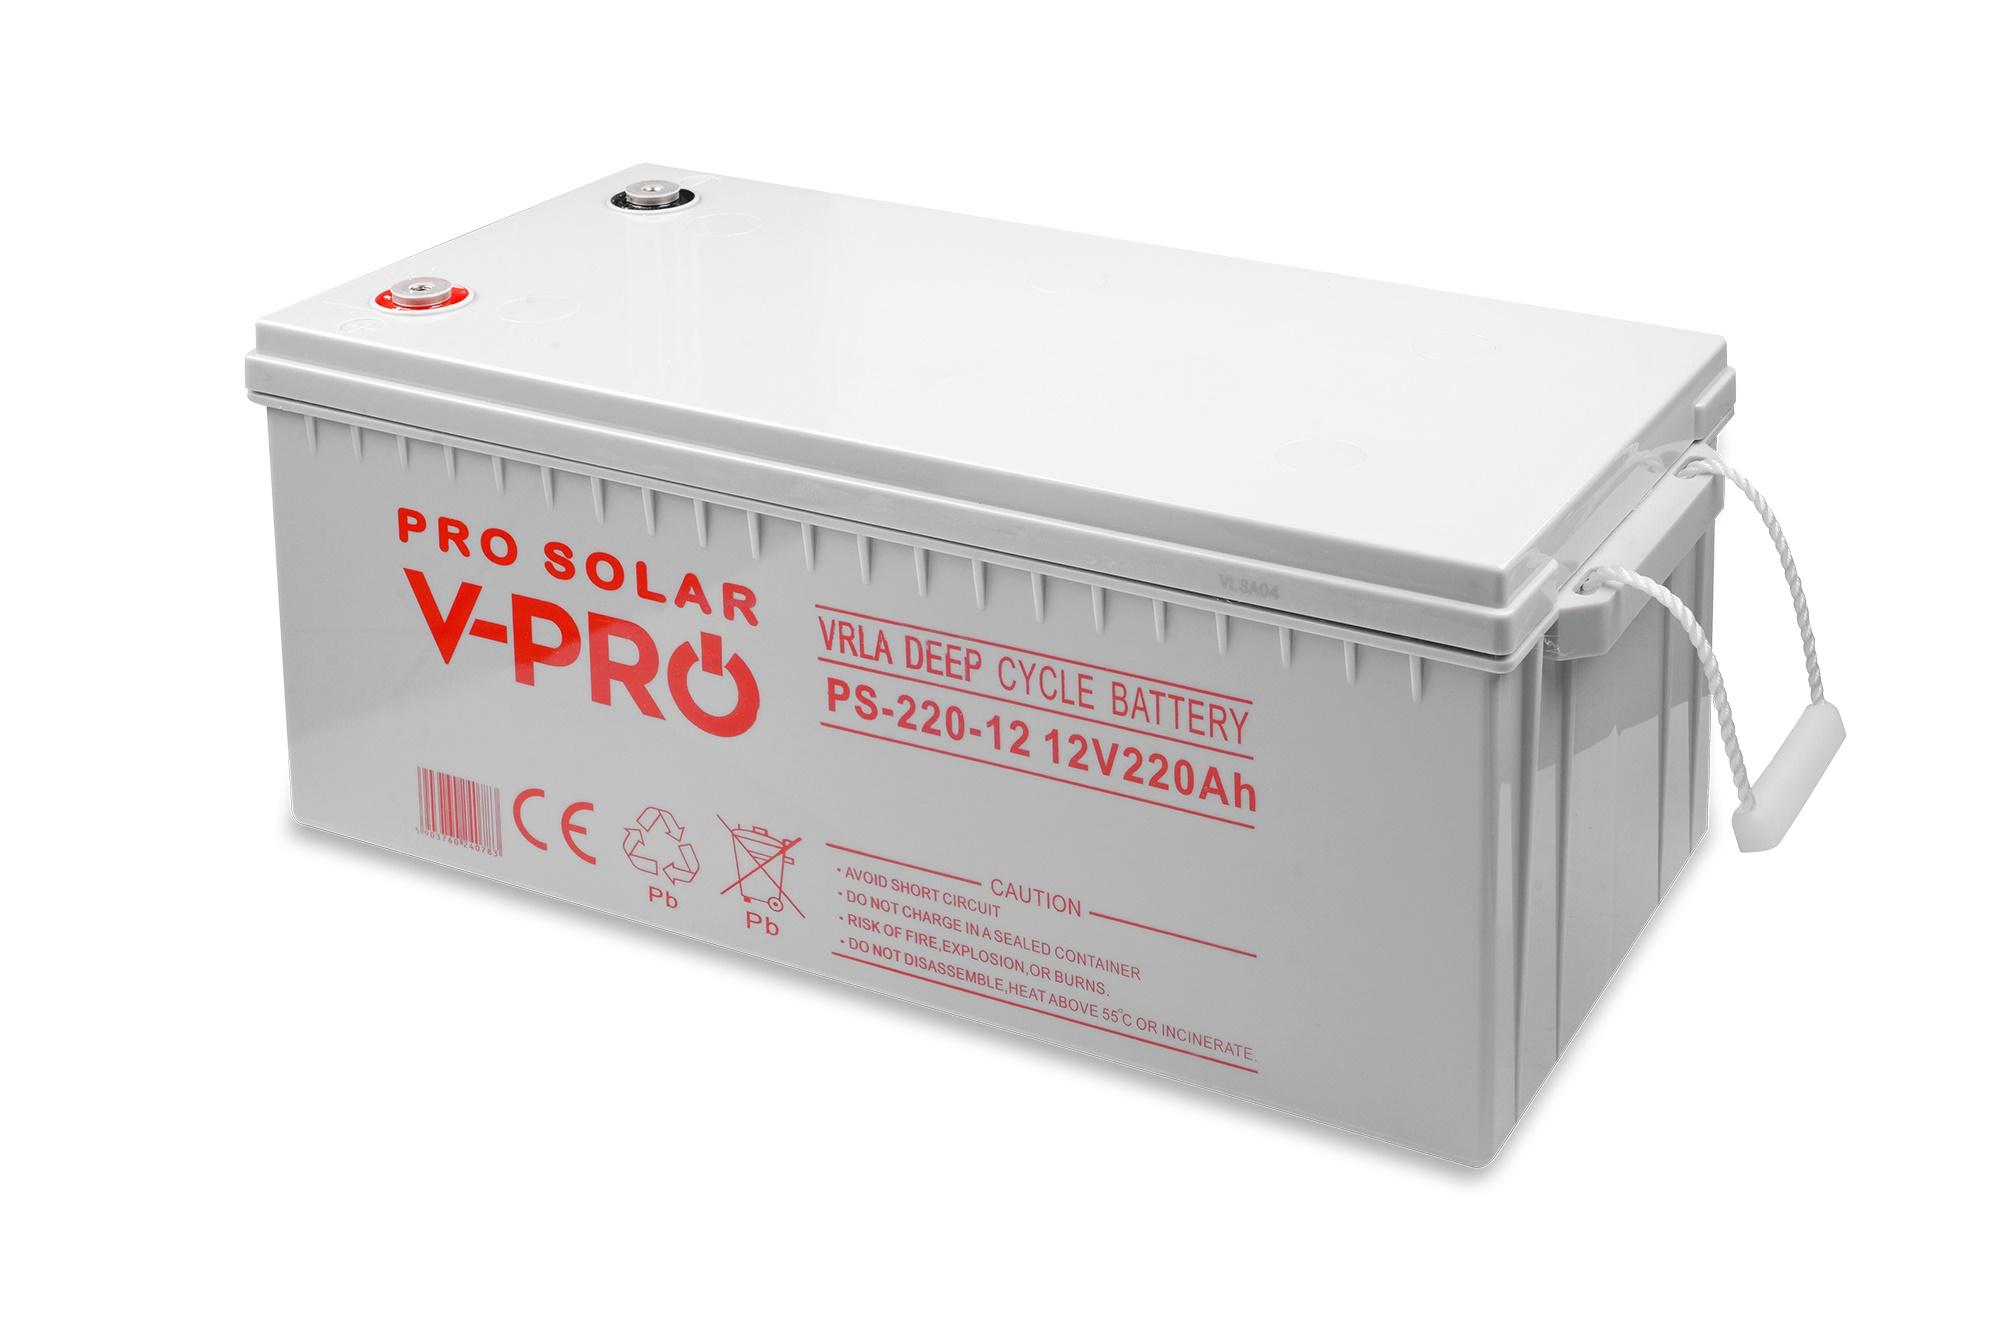 AGM Deep Cycle Batterie 12V ProSolar 220Ah(C10) Wohnmobil Solar Elektrofahrzeuge Traktionsbatterie